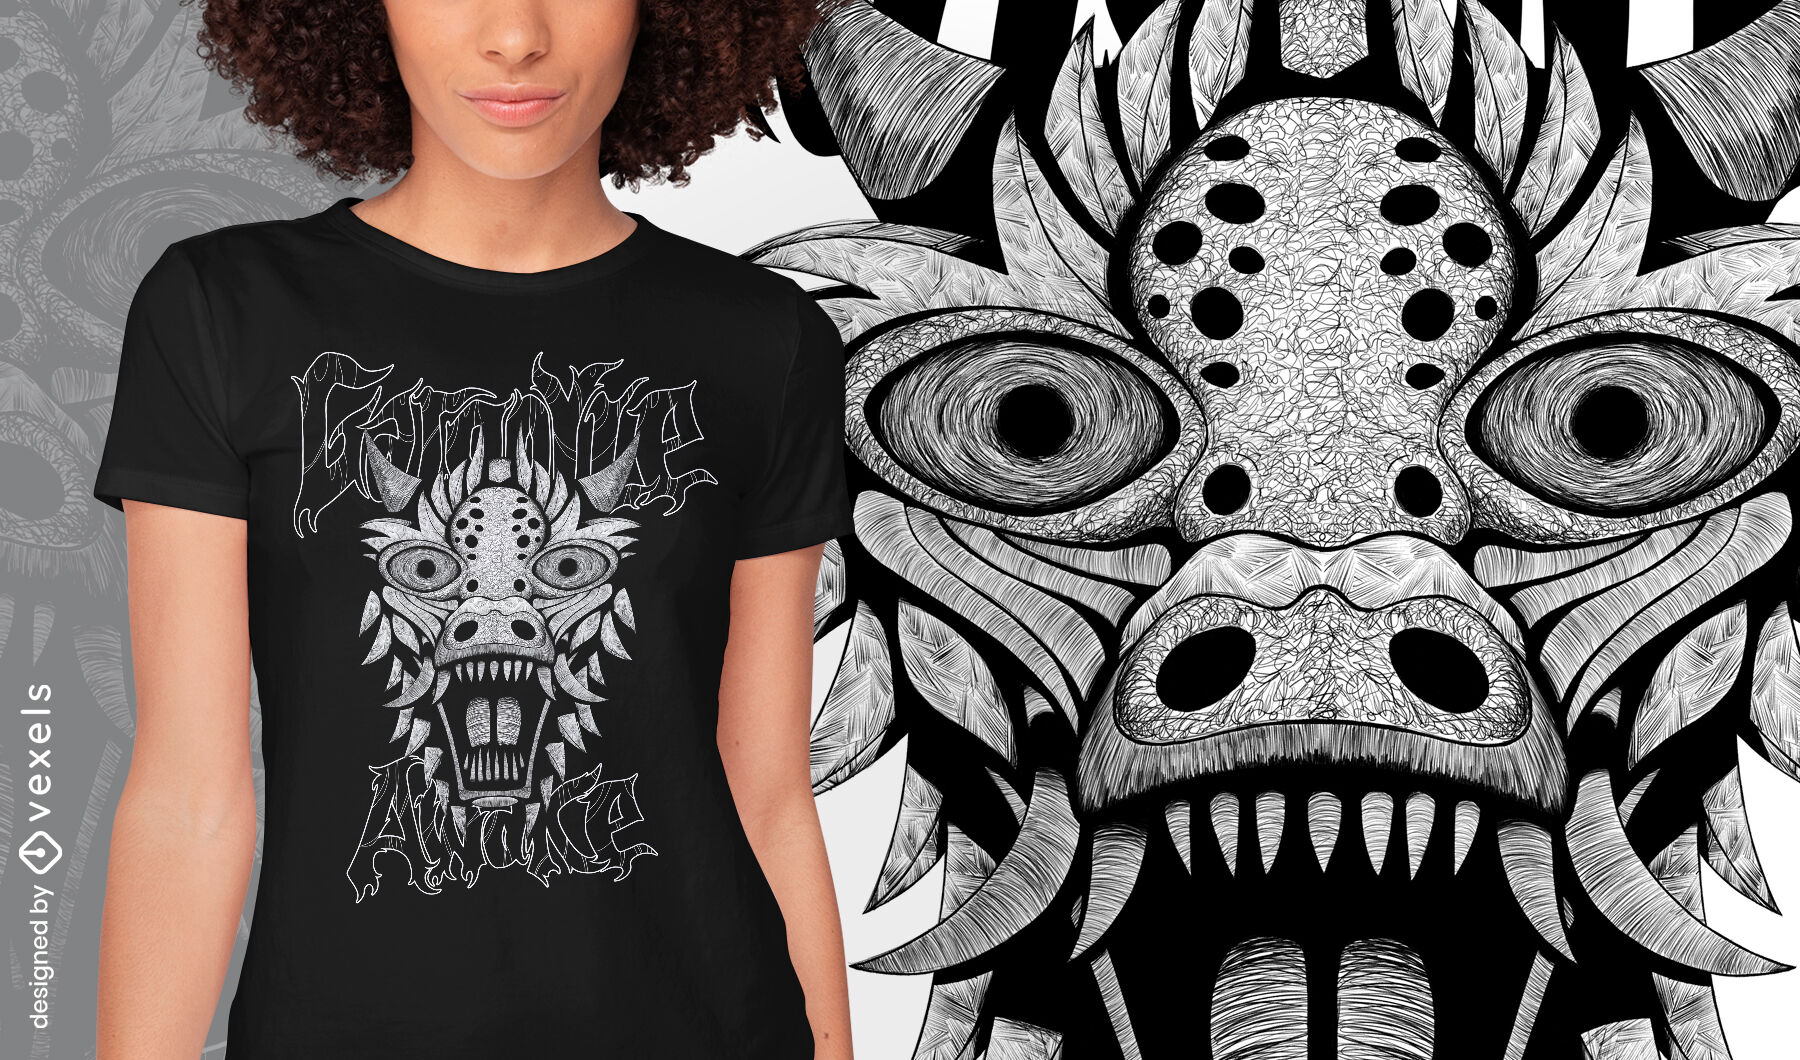 Camiseta dibujada a mano monstruo drag?n g?rgola psd